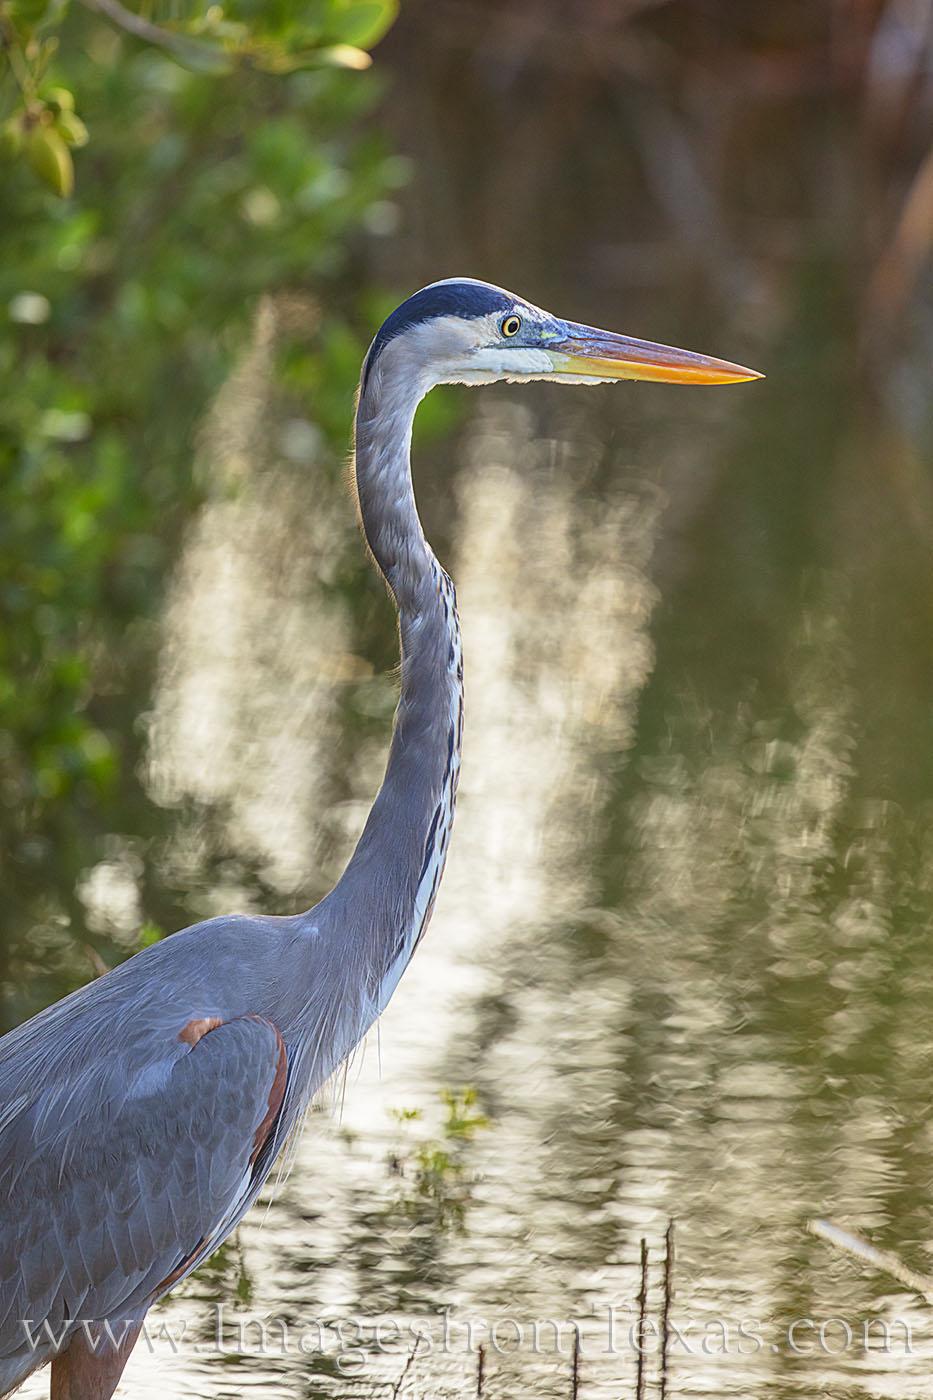 blue heron, heron, south padre, bird, south padre island, birds, texas coast, south texas, photo